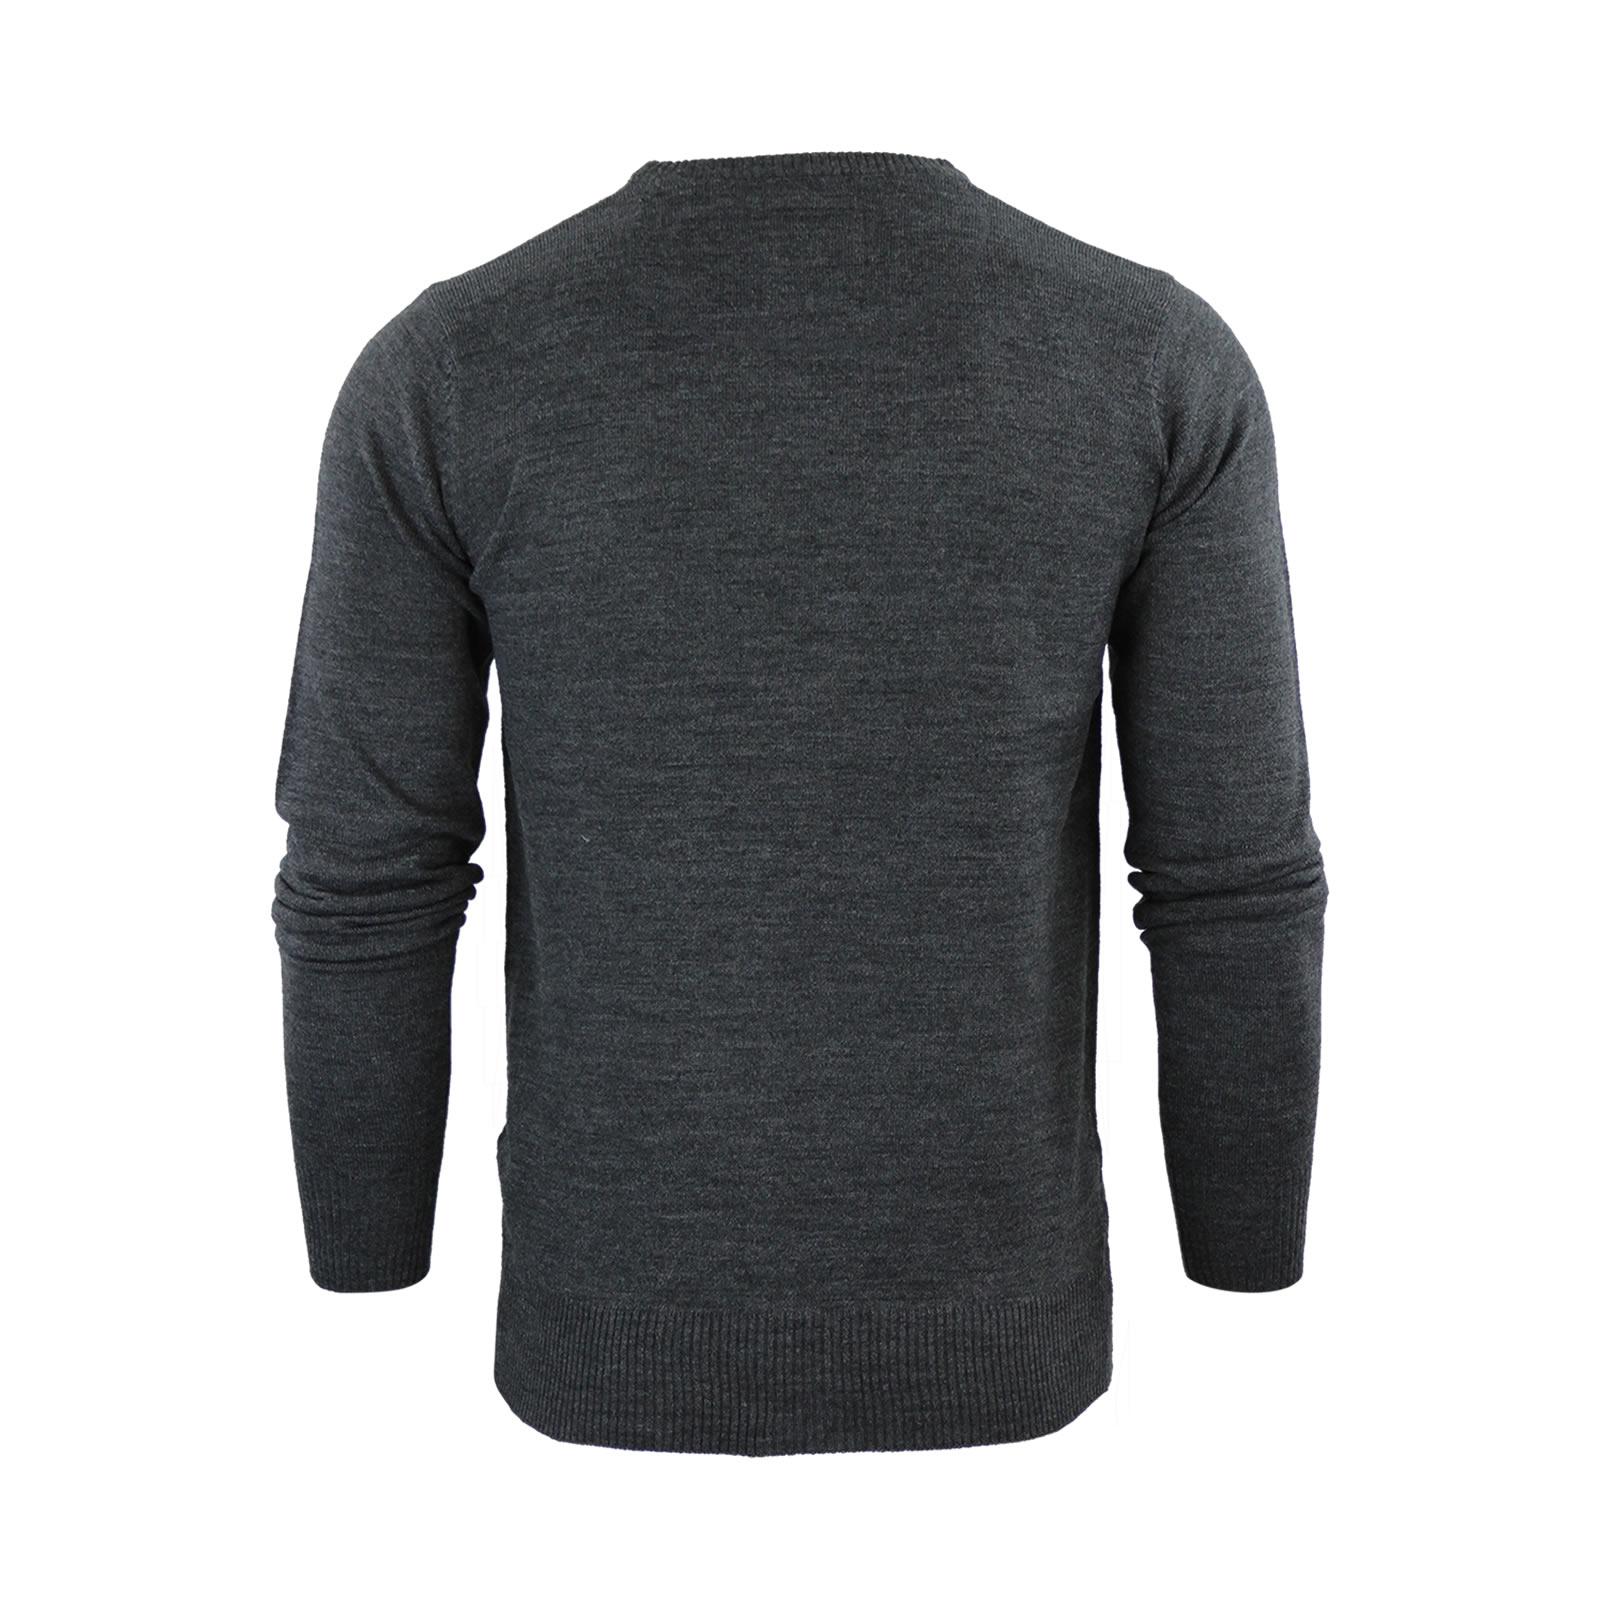 Mens-Jumper-Brave-Soul-Urbain-Knitted-Crew-Neck-Sweater thumbnail 6